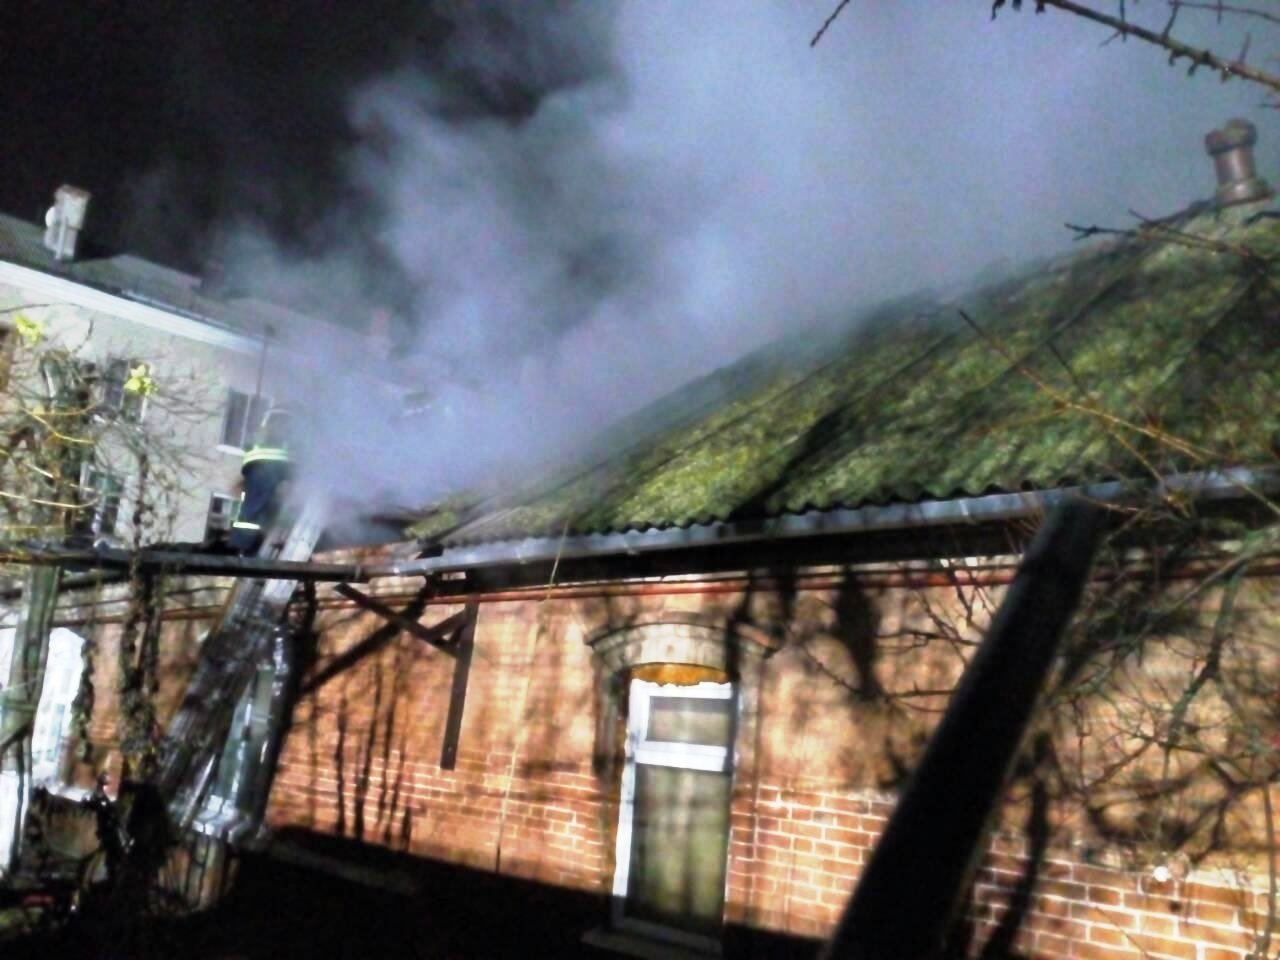 В Бердянске пожар в частном доме тушили 16 спасателей, – ФОТО, фото-1